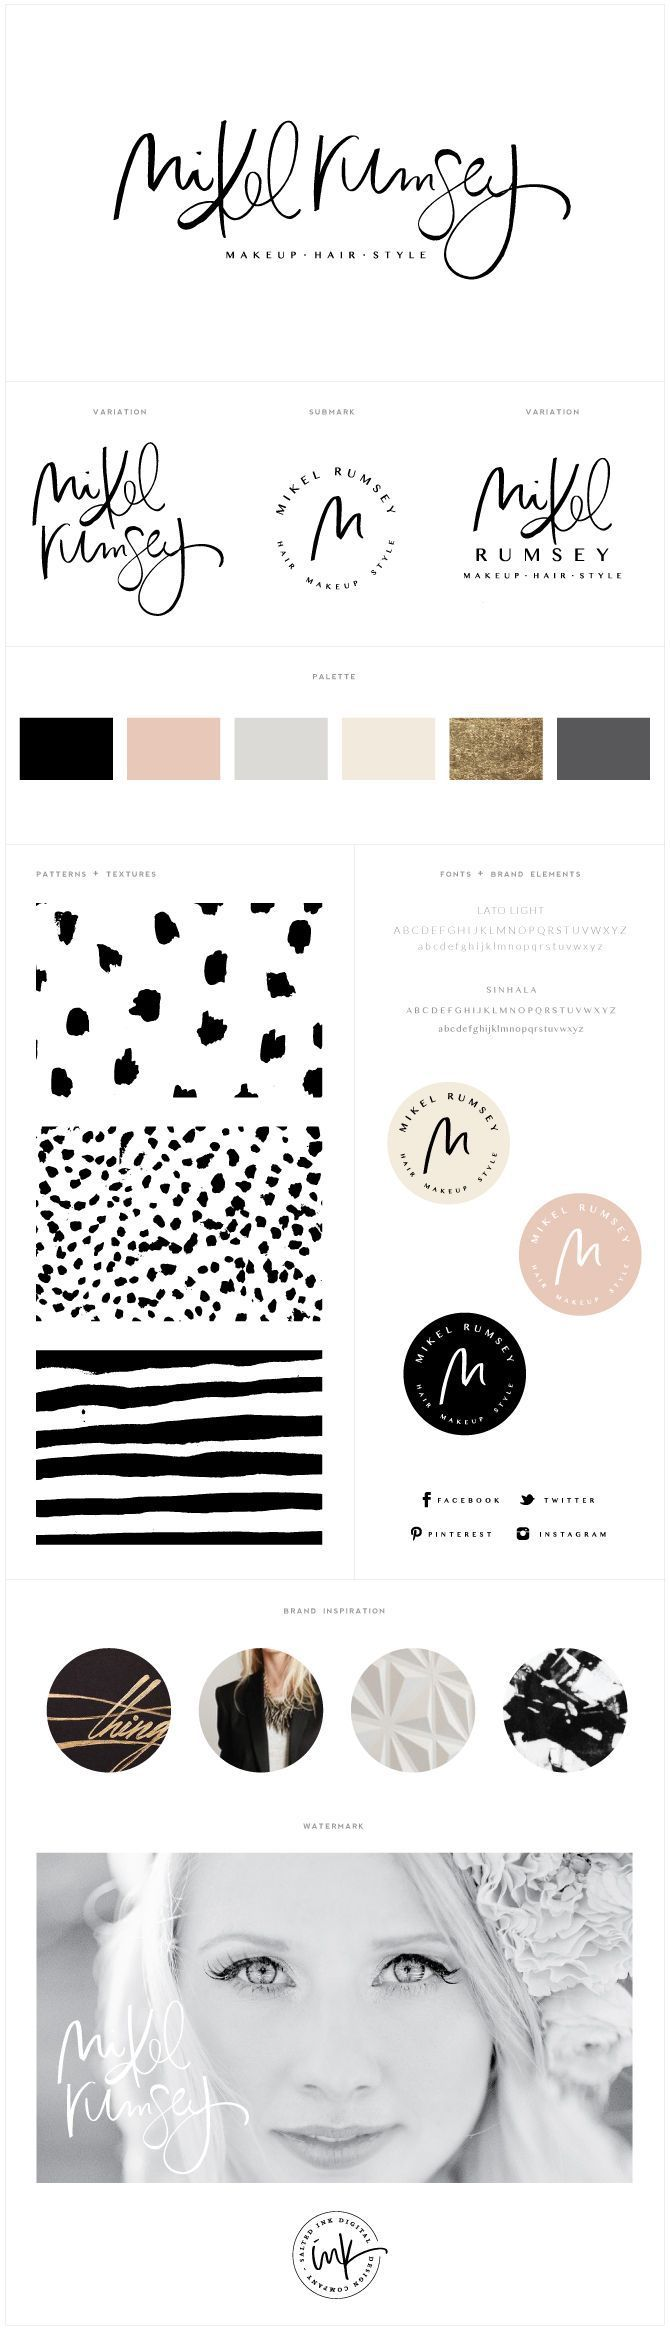 Brand Launch: Mikel Rumsey | Brand Board, Brand Styling, Brand Design, Hand Letterer, Hand Lettered, Hand Drawn, Brush Pen | www.saltedink.com